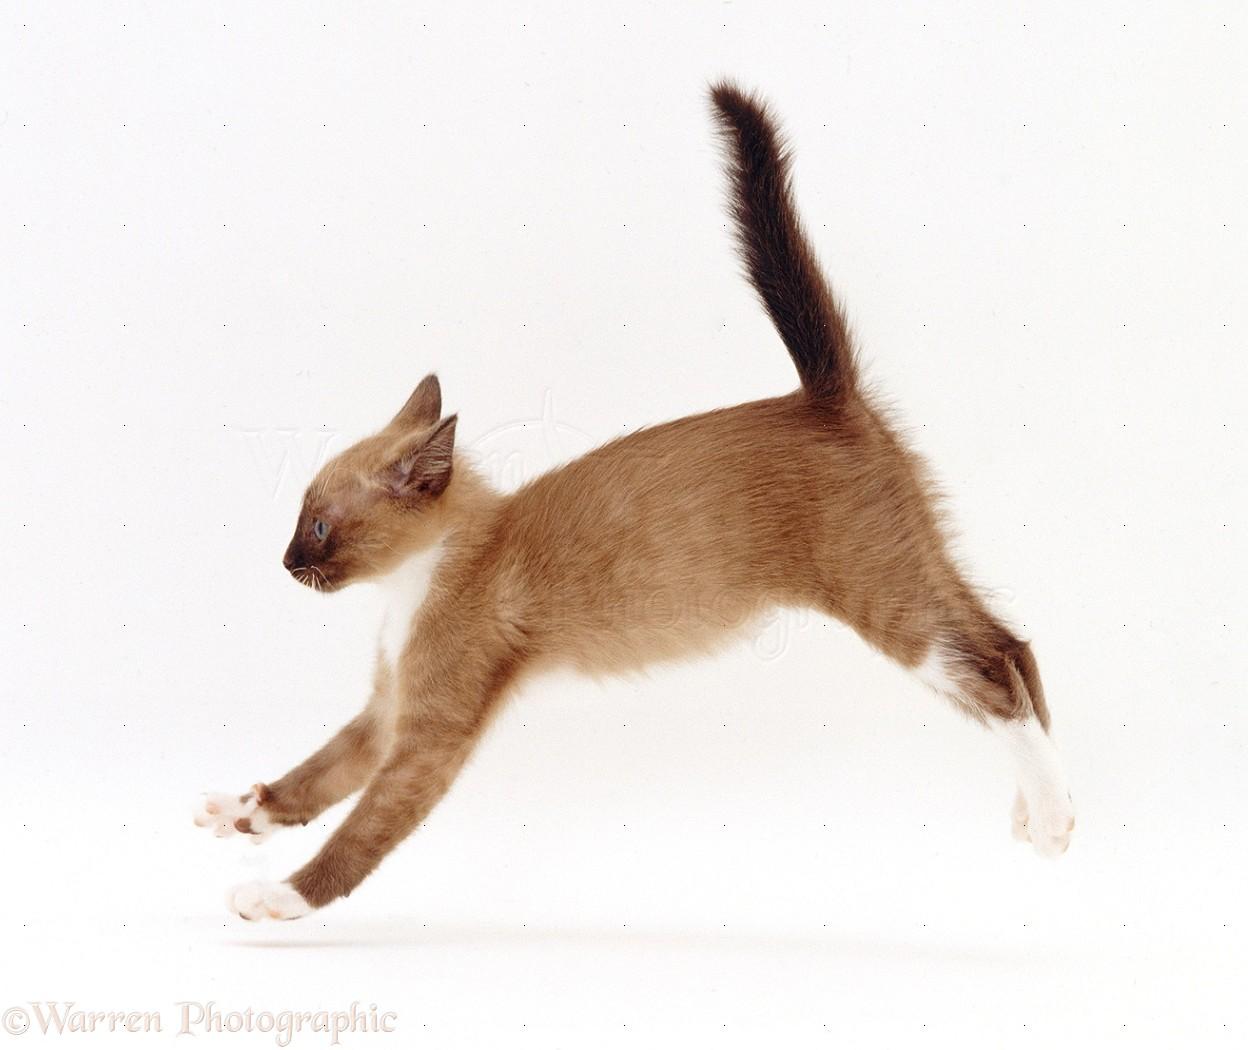 kitten cant poop